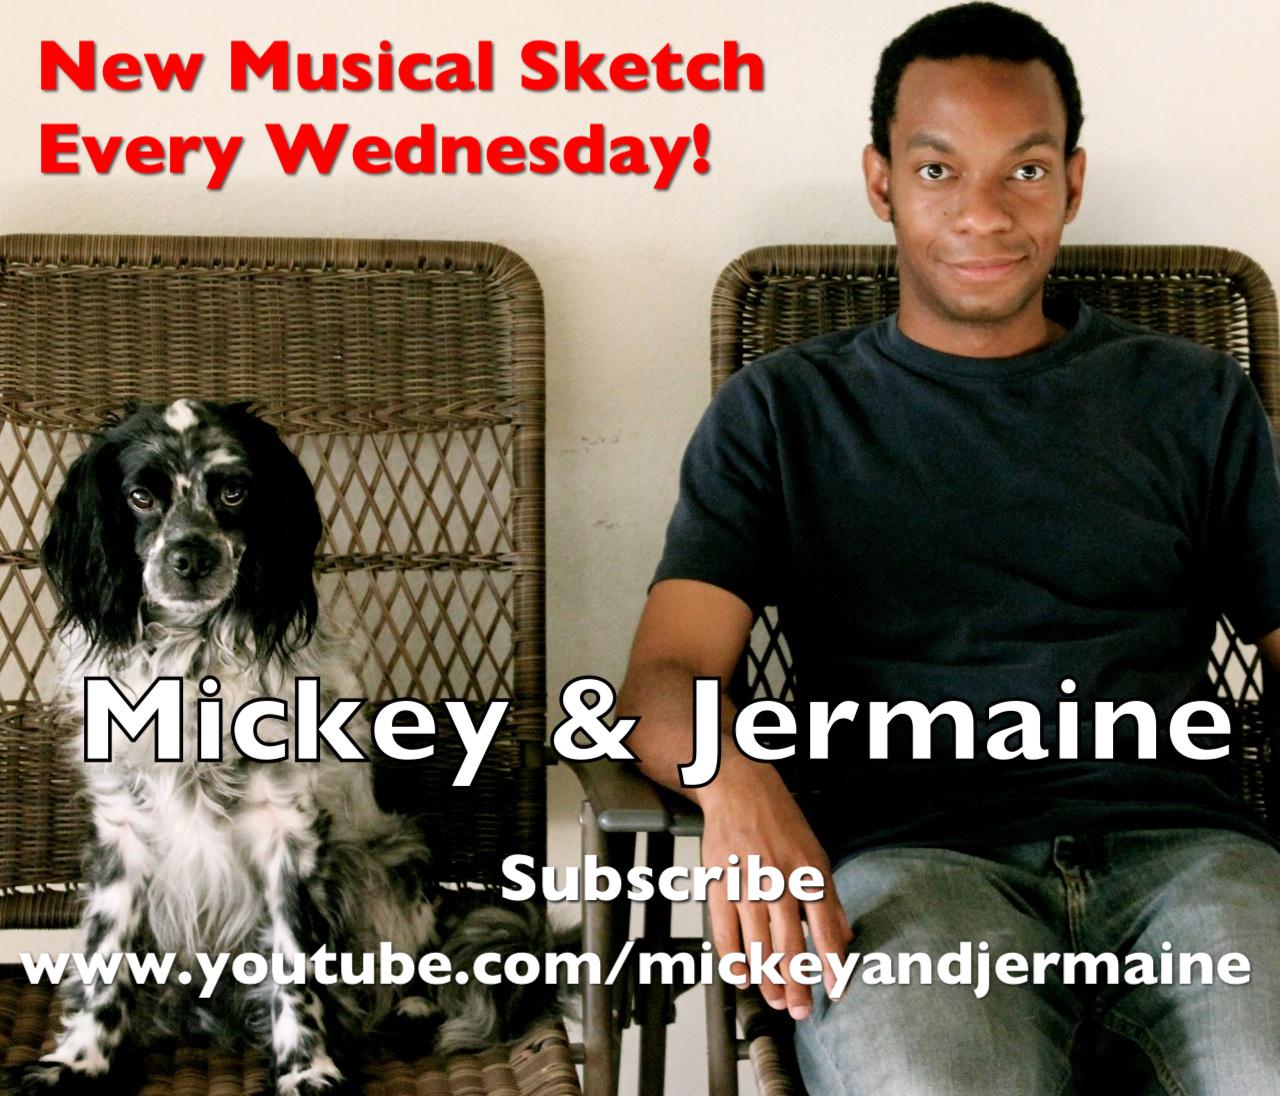 Mickey & Jermaine